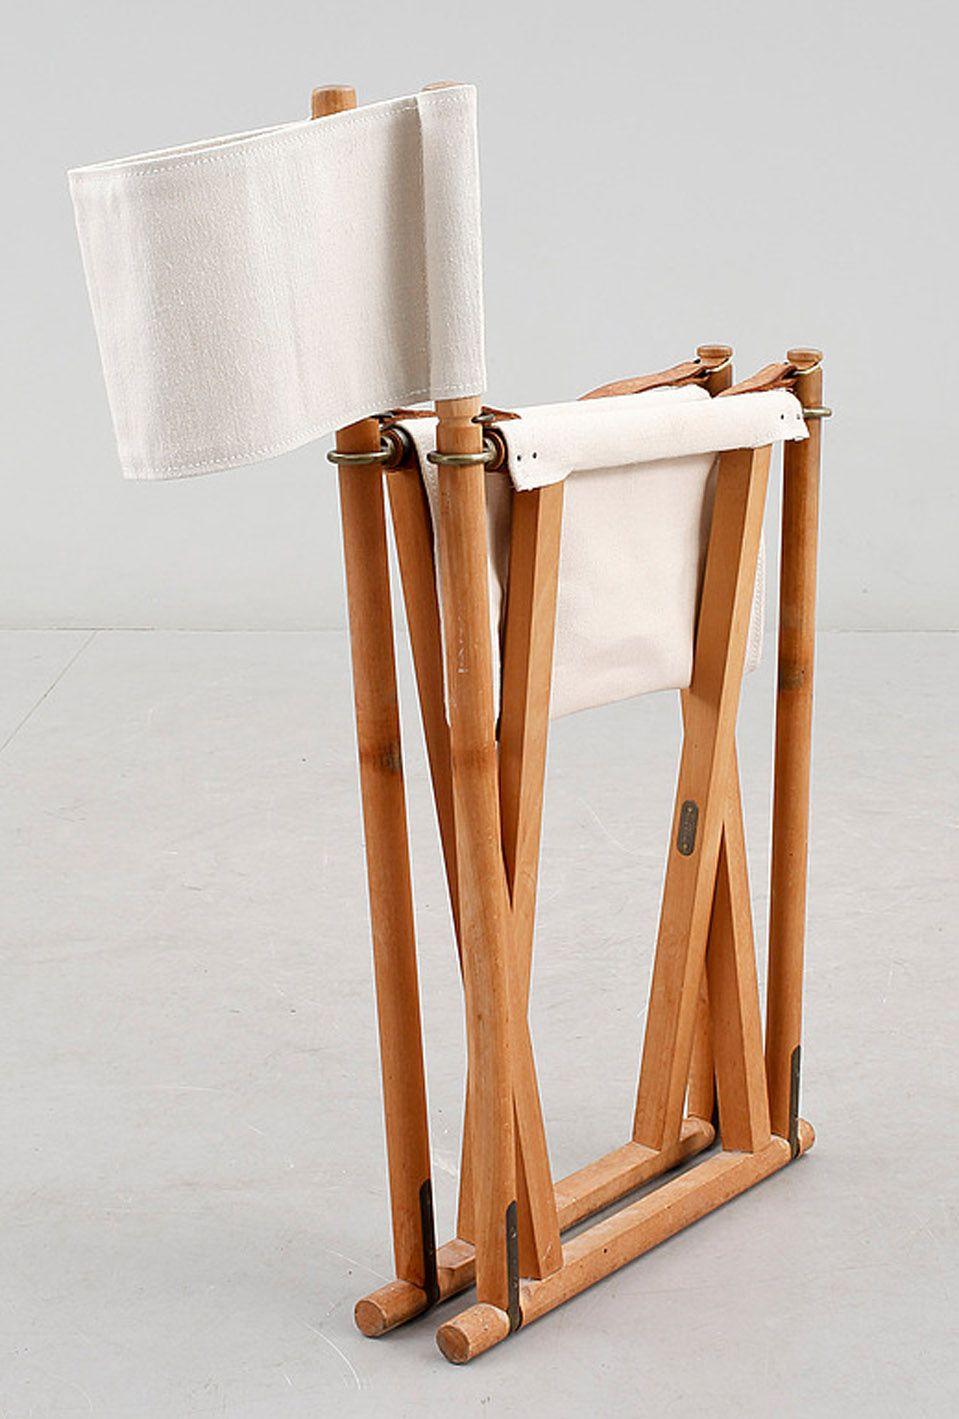 Superieur MK Chair, Design By Morgens Koch, 1932